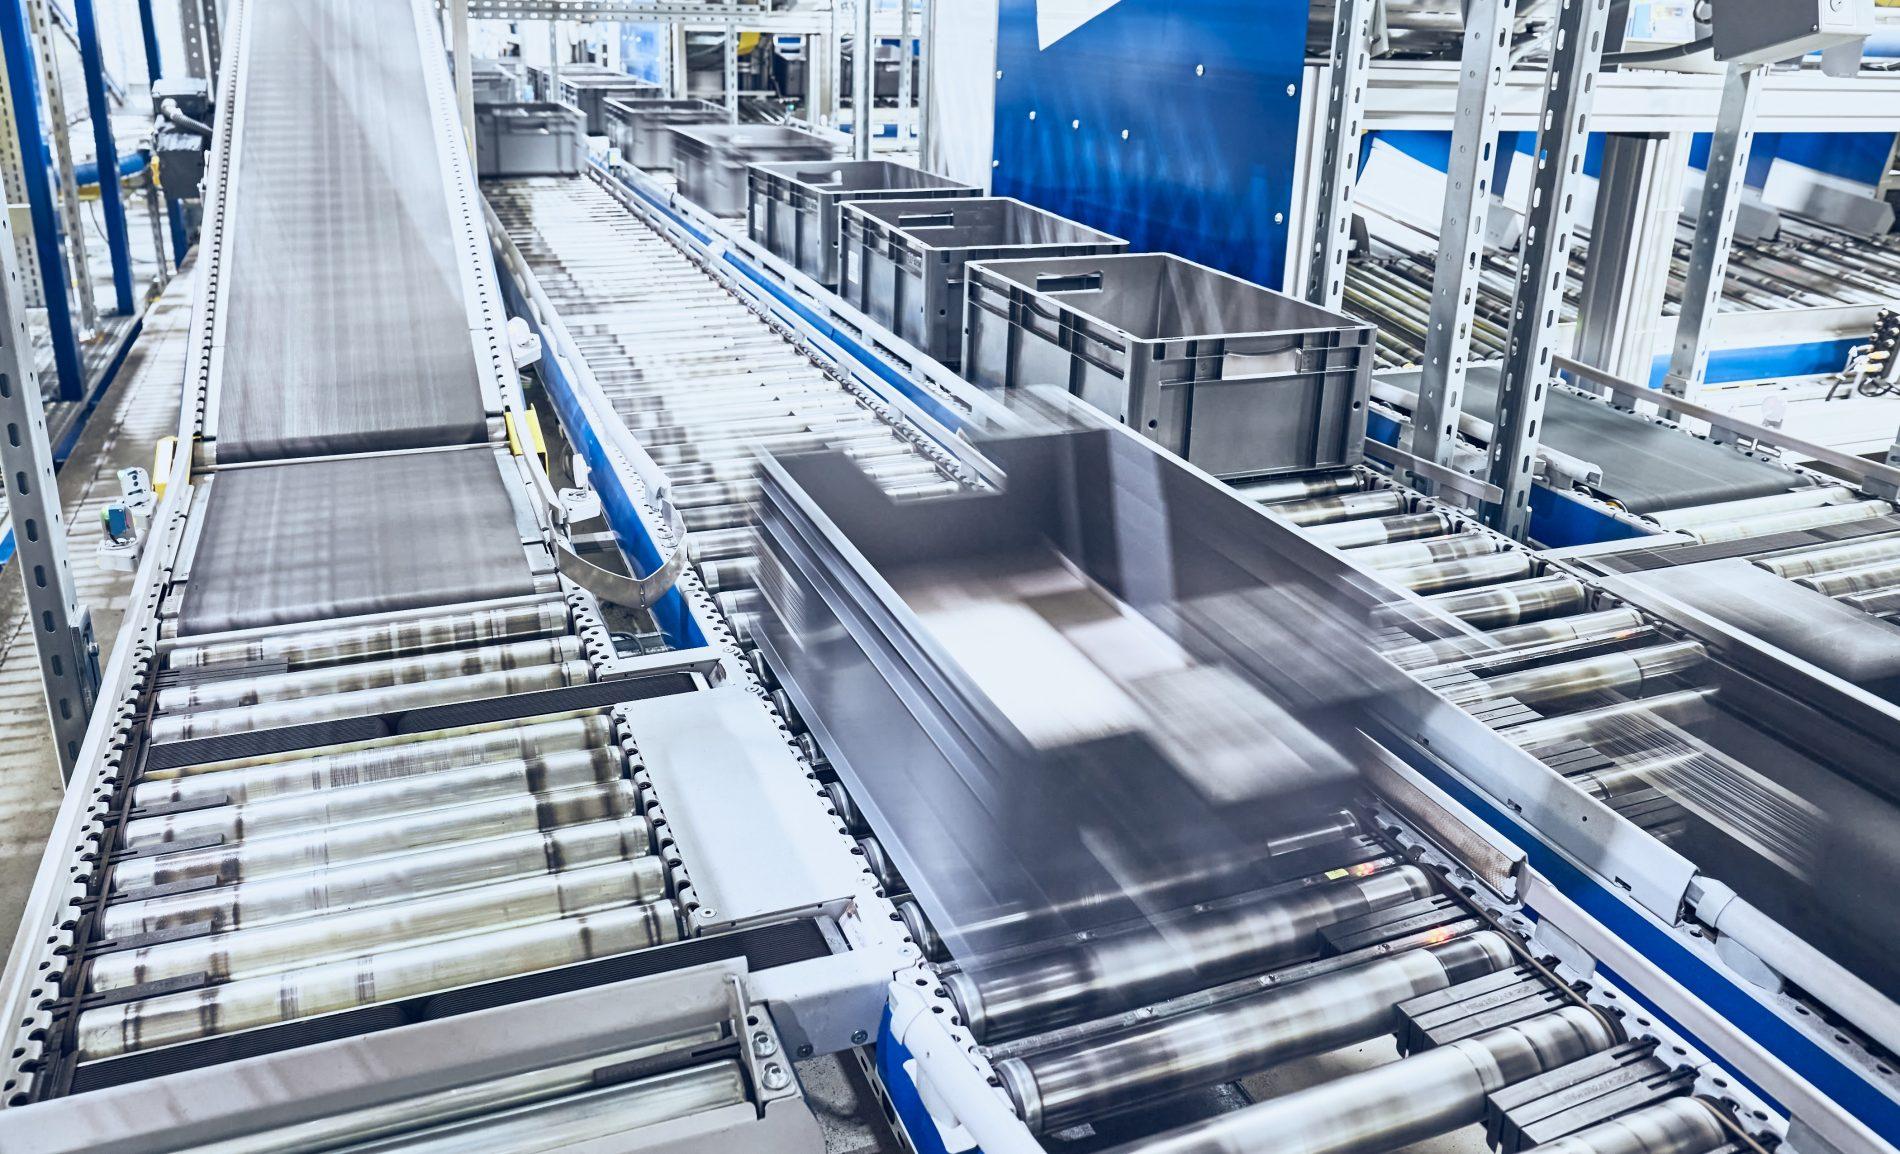 Producent Lineaire Industrie Transport Distributie Pillen Group